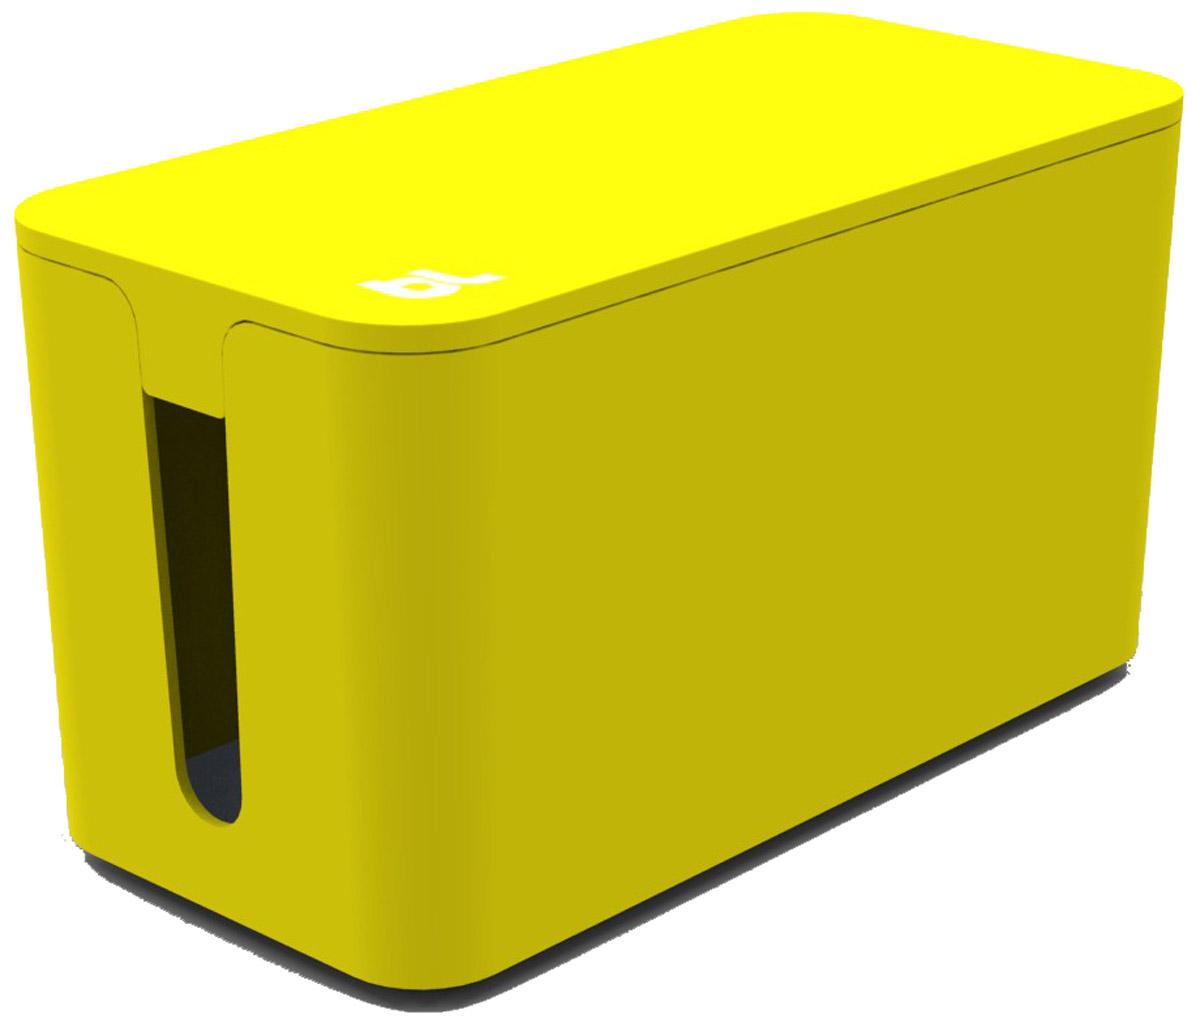 Bluelounge CableBox Mini, Yellow бокс для хранения проводов и сетевого фильтра aaden aa bluelounge